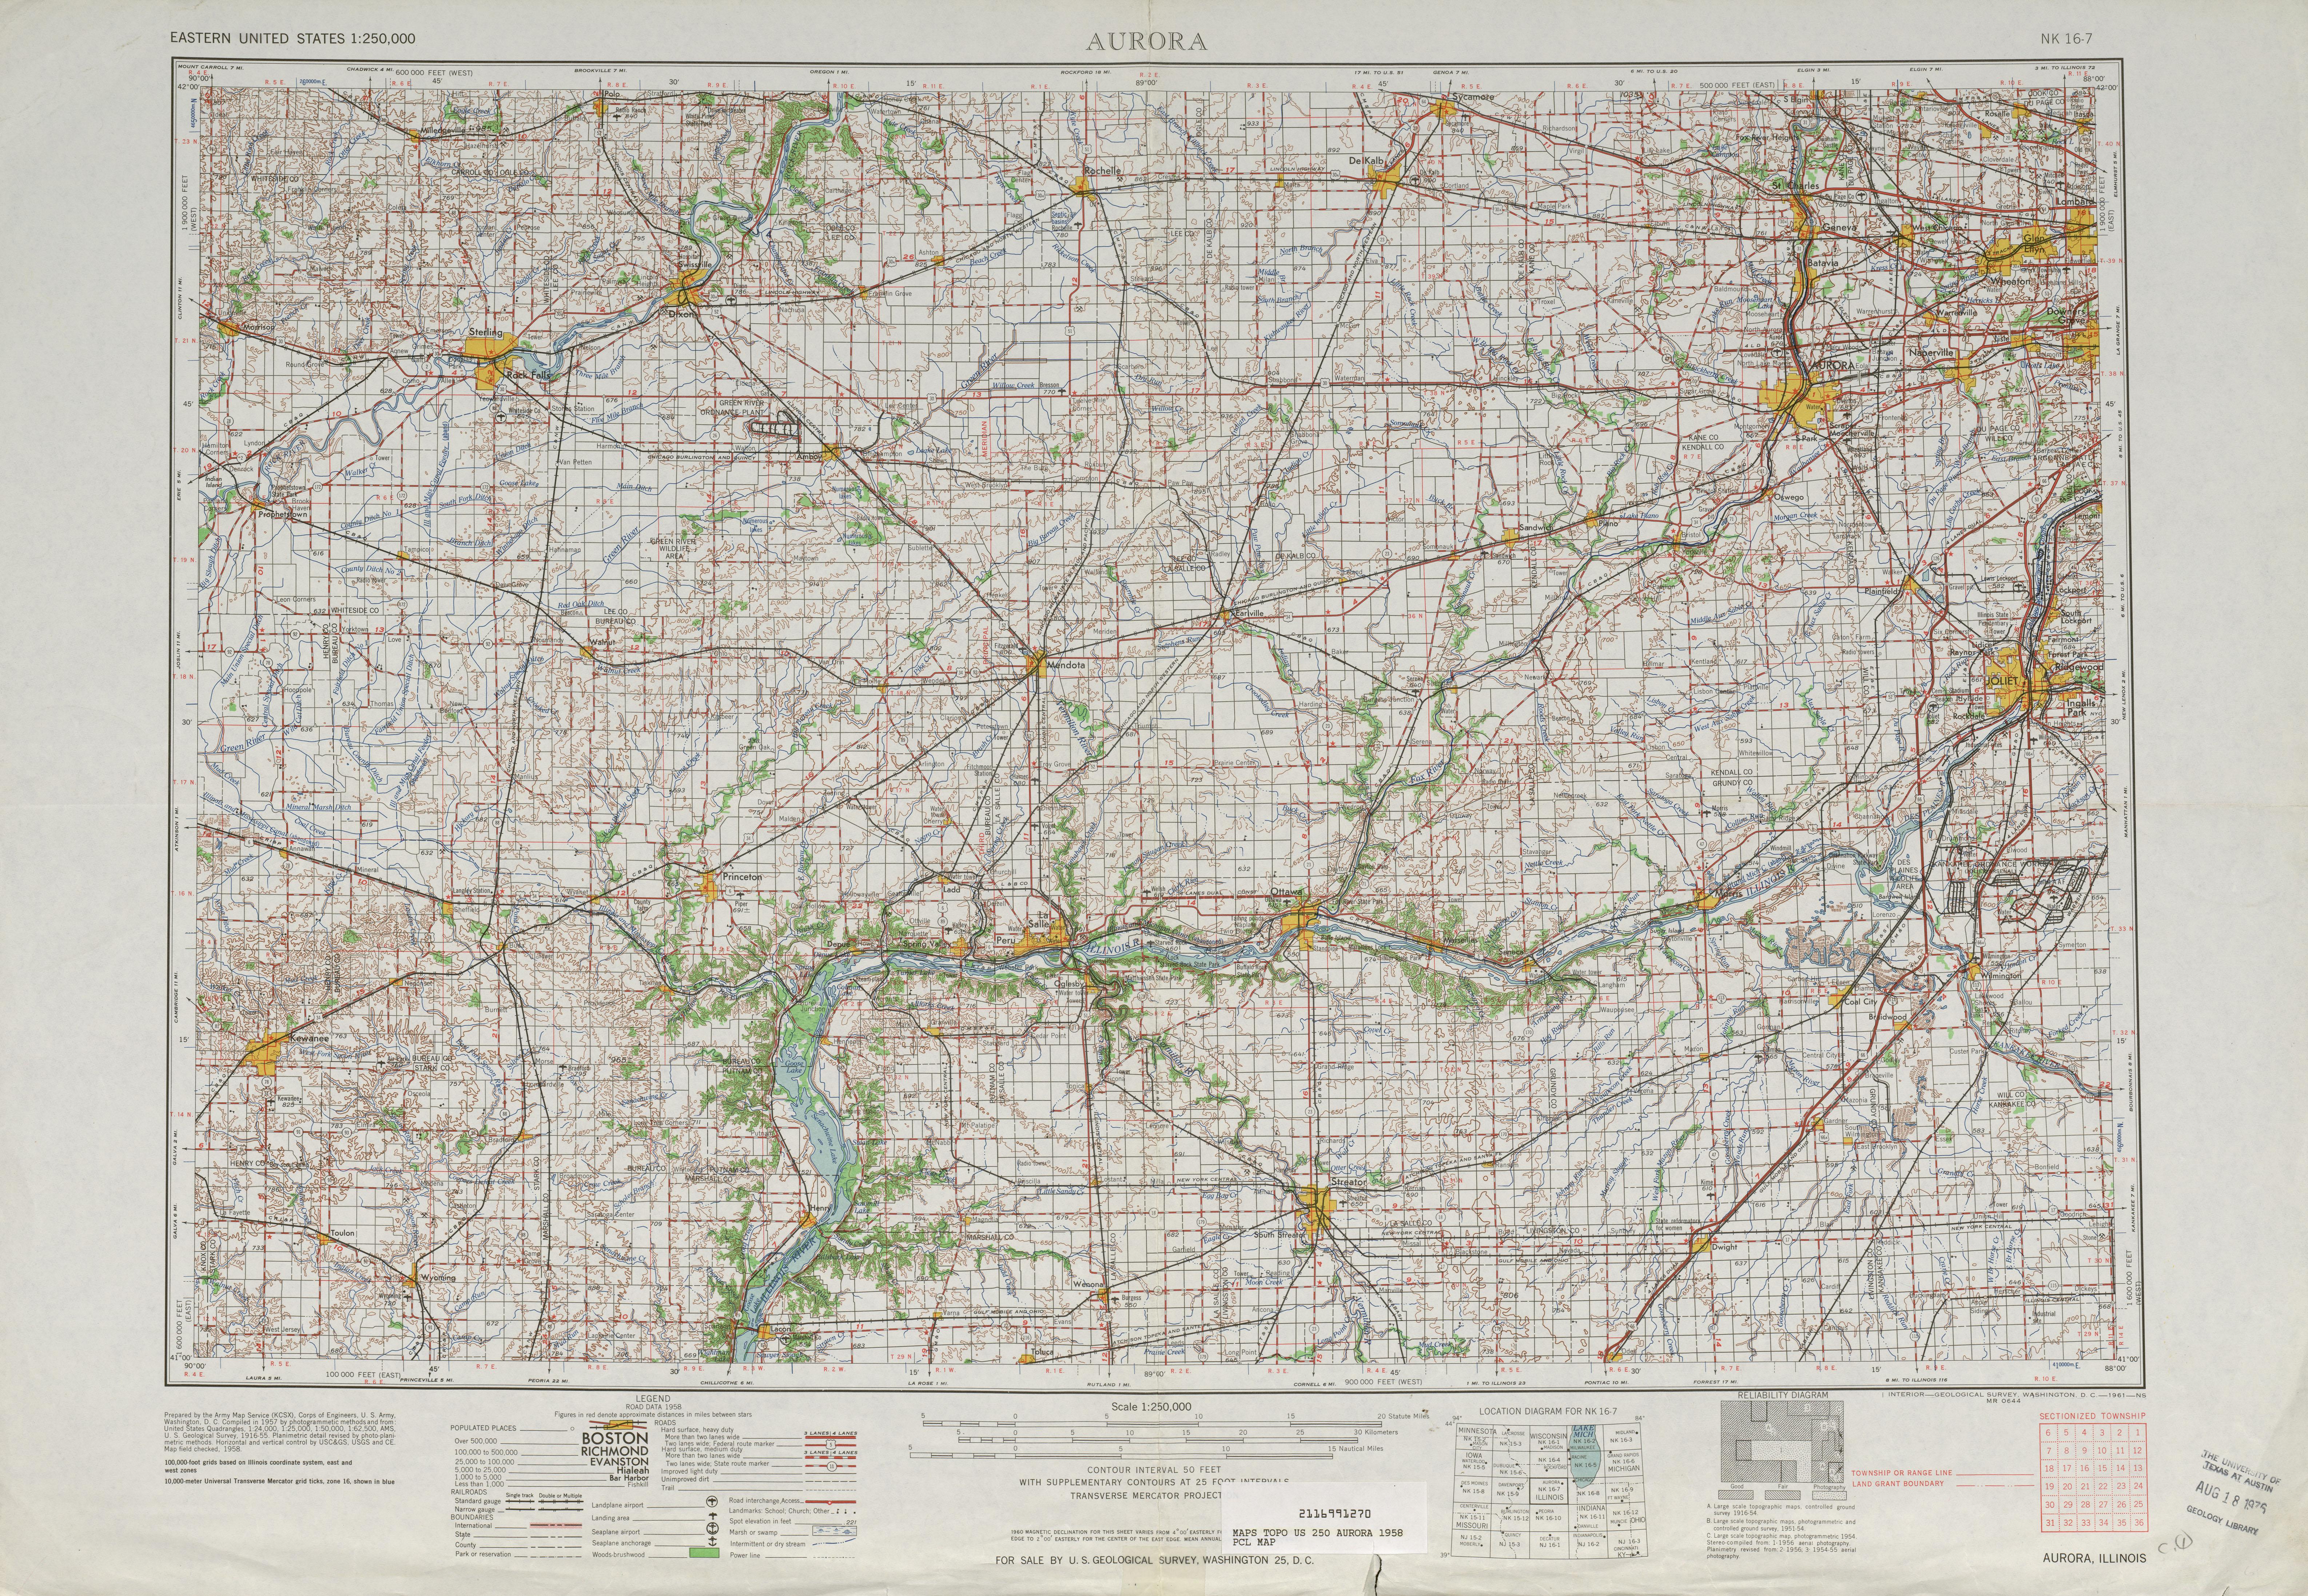 Aurora Topographic Map Sheet, United States 1958